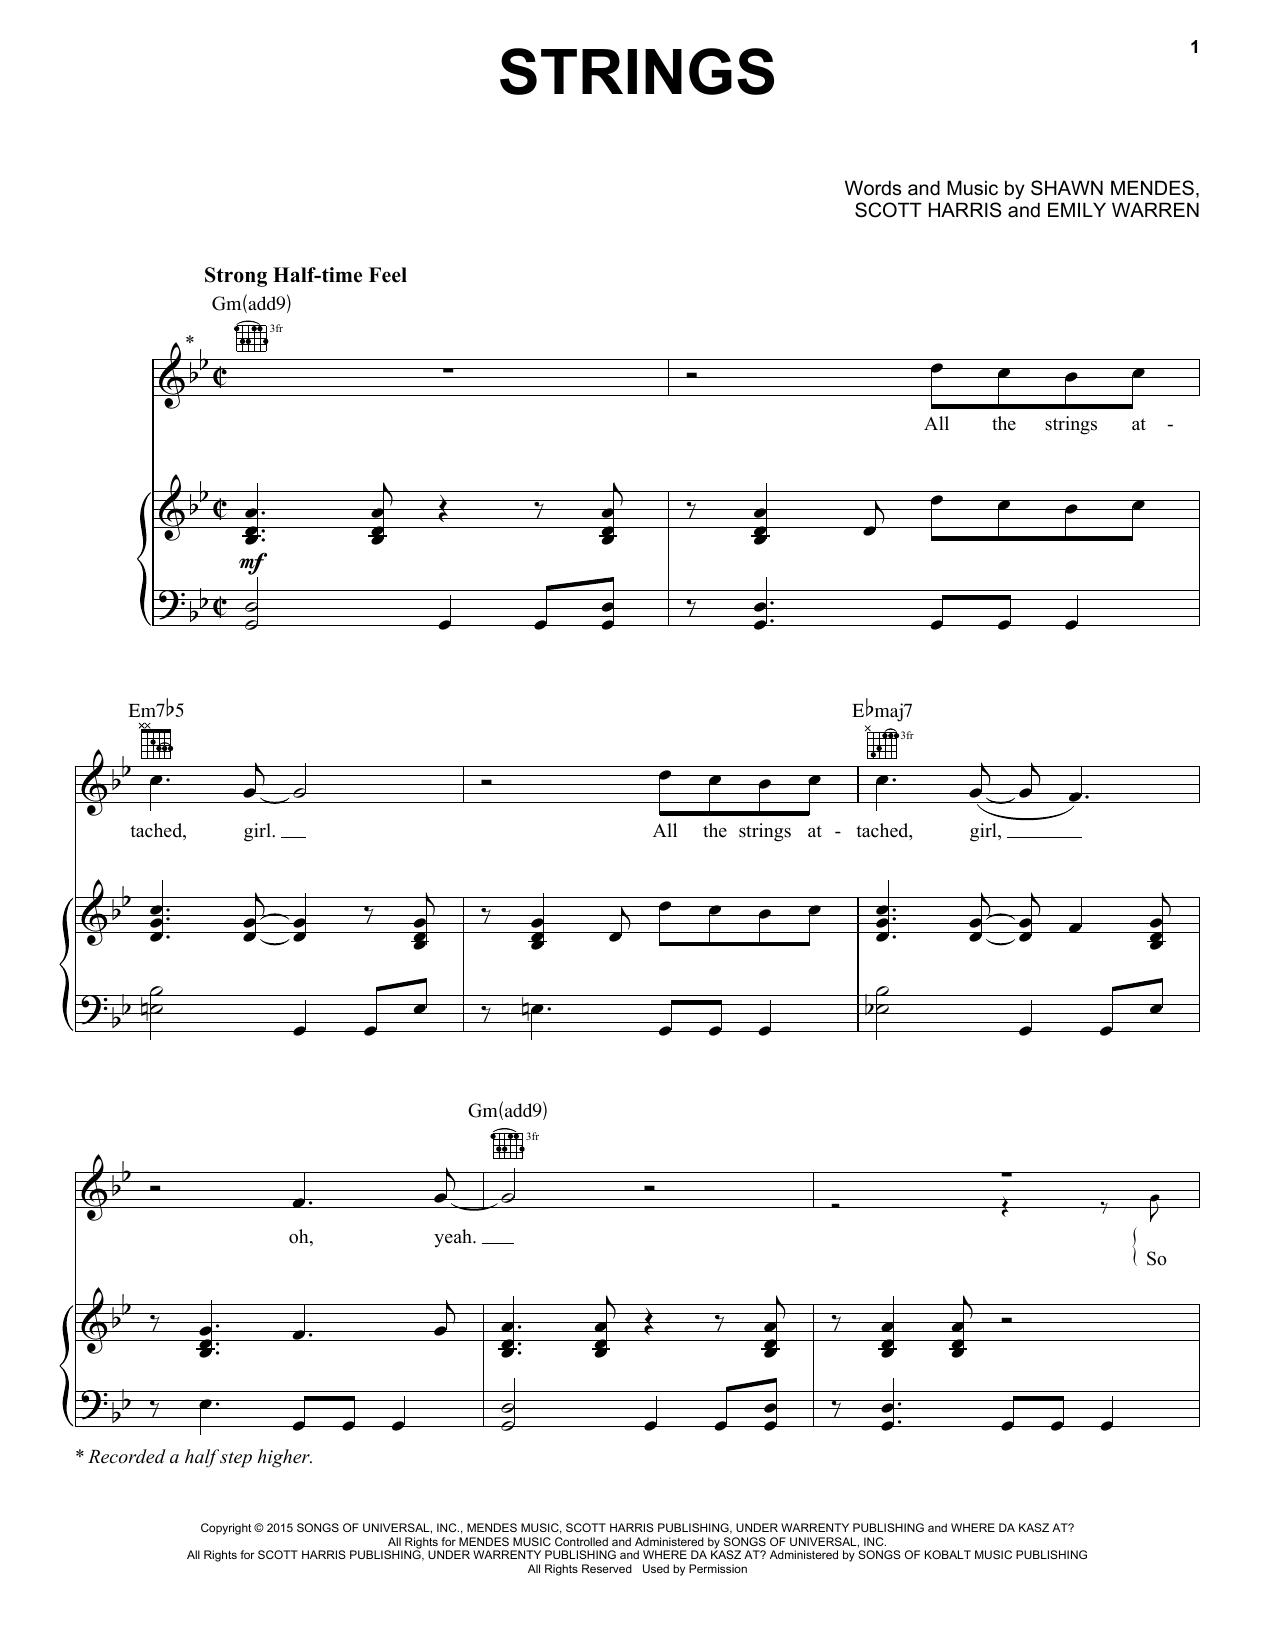 Shawn Mendes 'Strings' Sheet Music Notes, Chords | Download Printable  Piano, Vocal & Guitar (Right-Hand Melody) - SKU: 160793